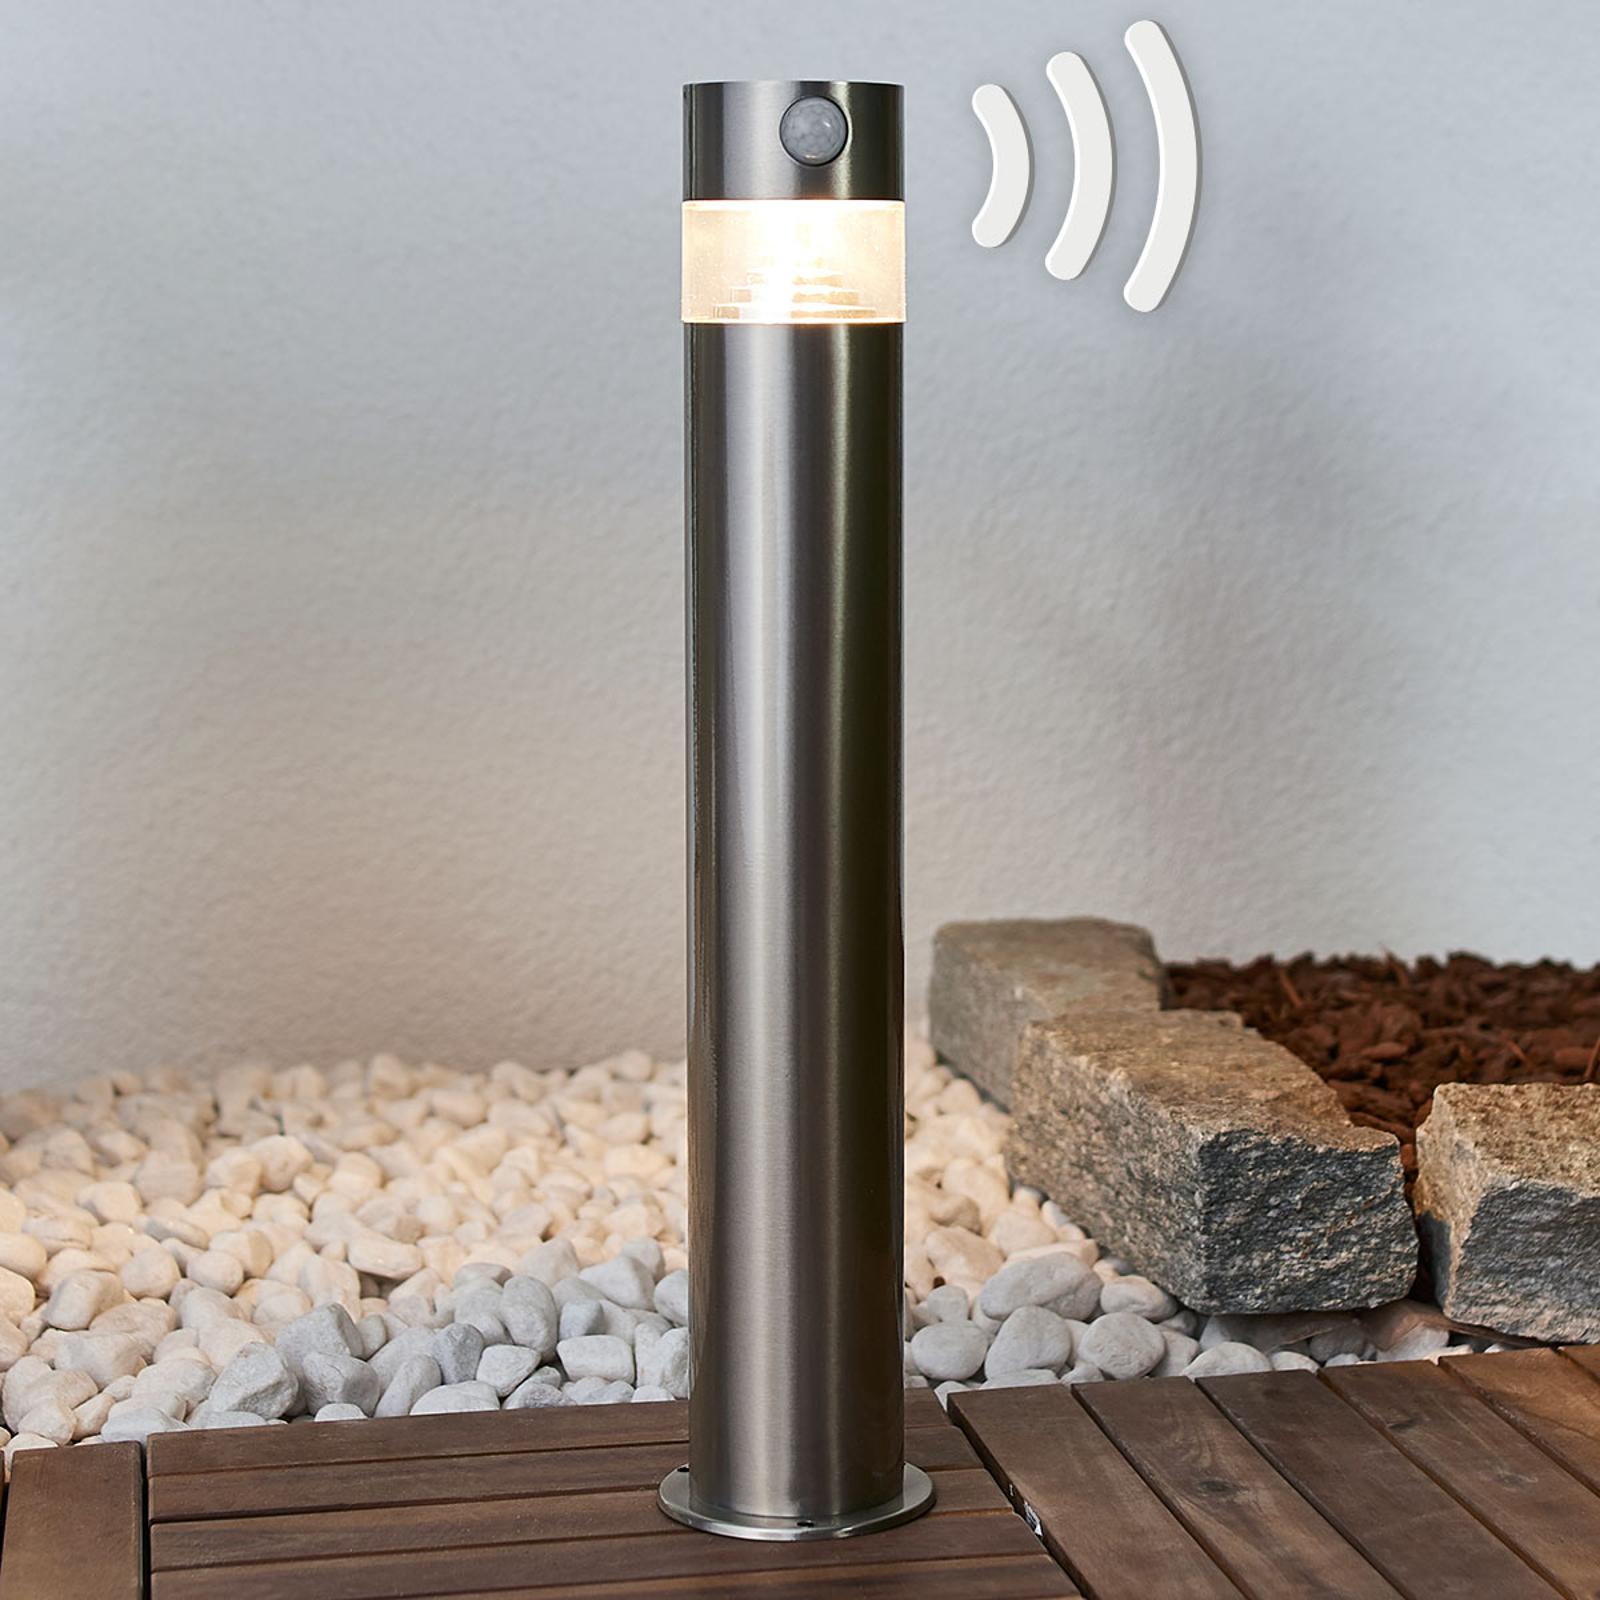 Potelet solaire LED Kalypso en inox